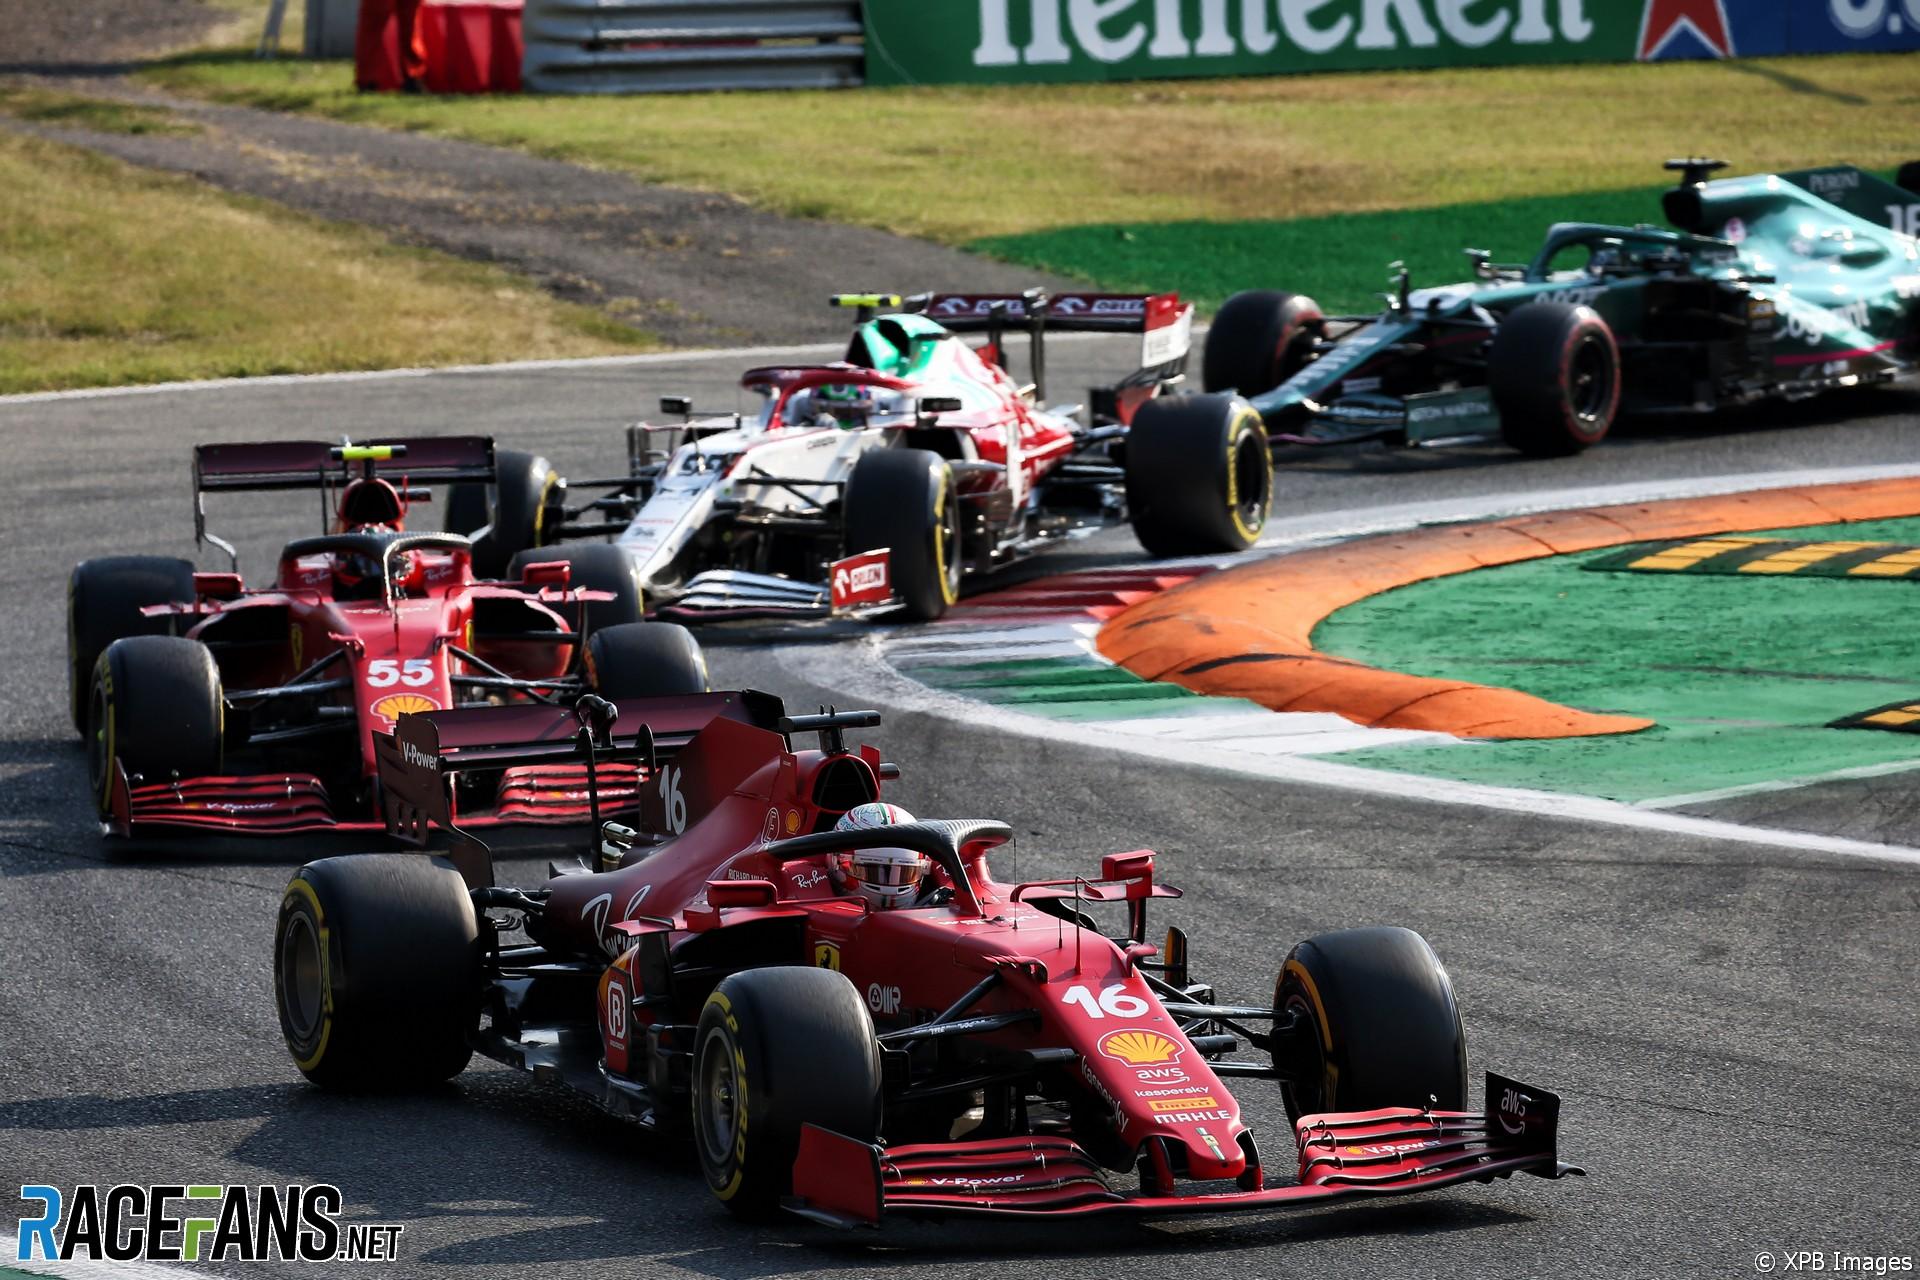 Charles Leclerc, Ferrari, Monza, 2021